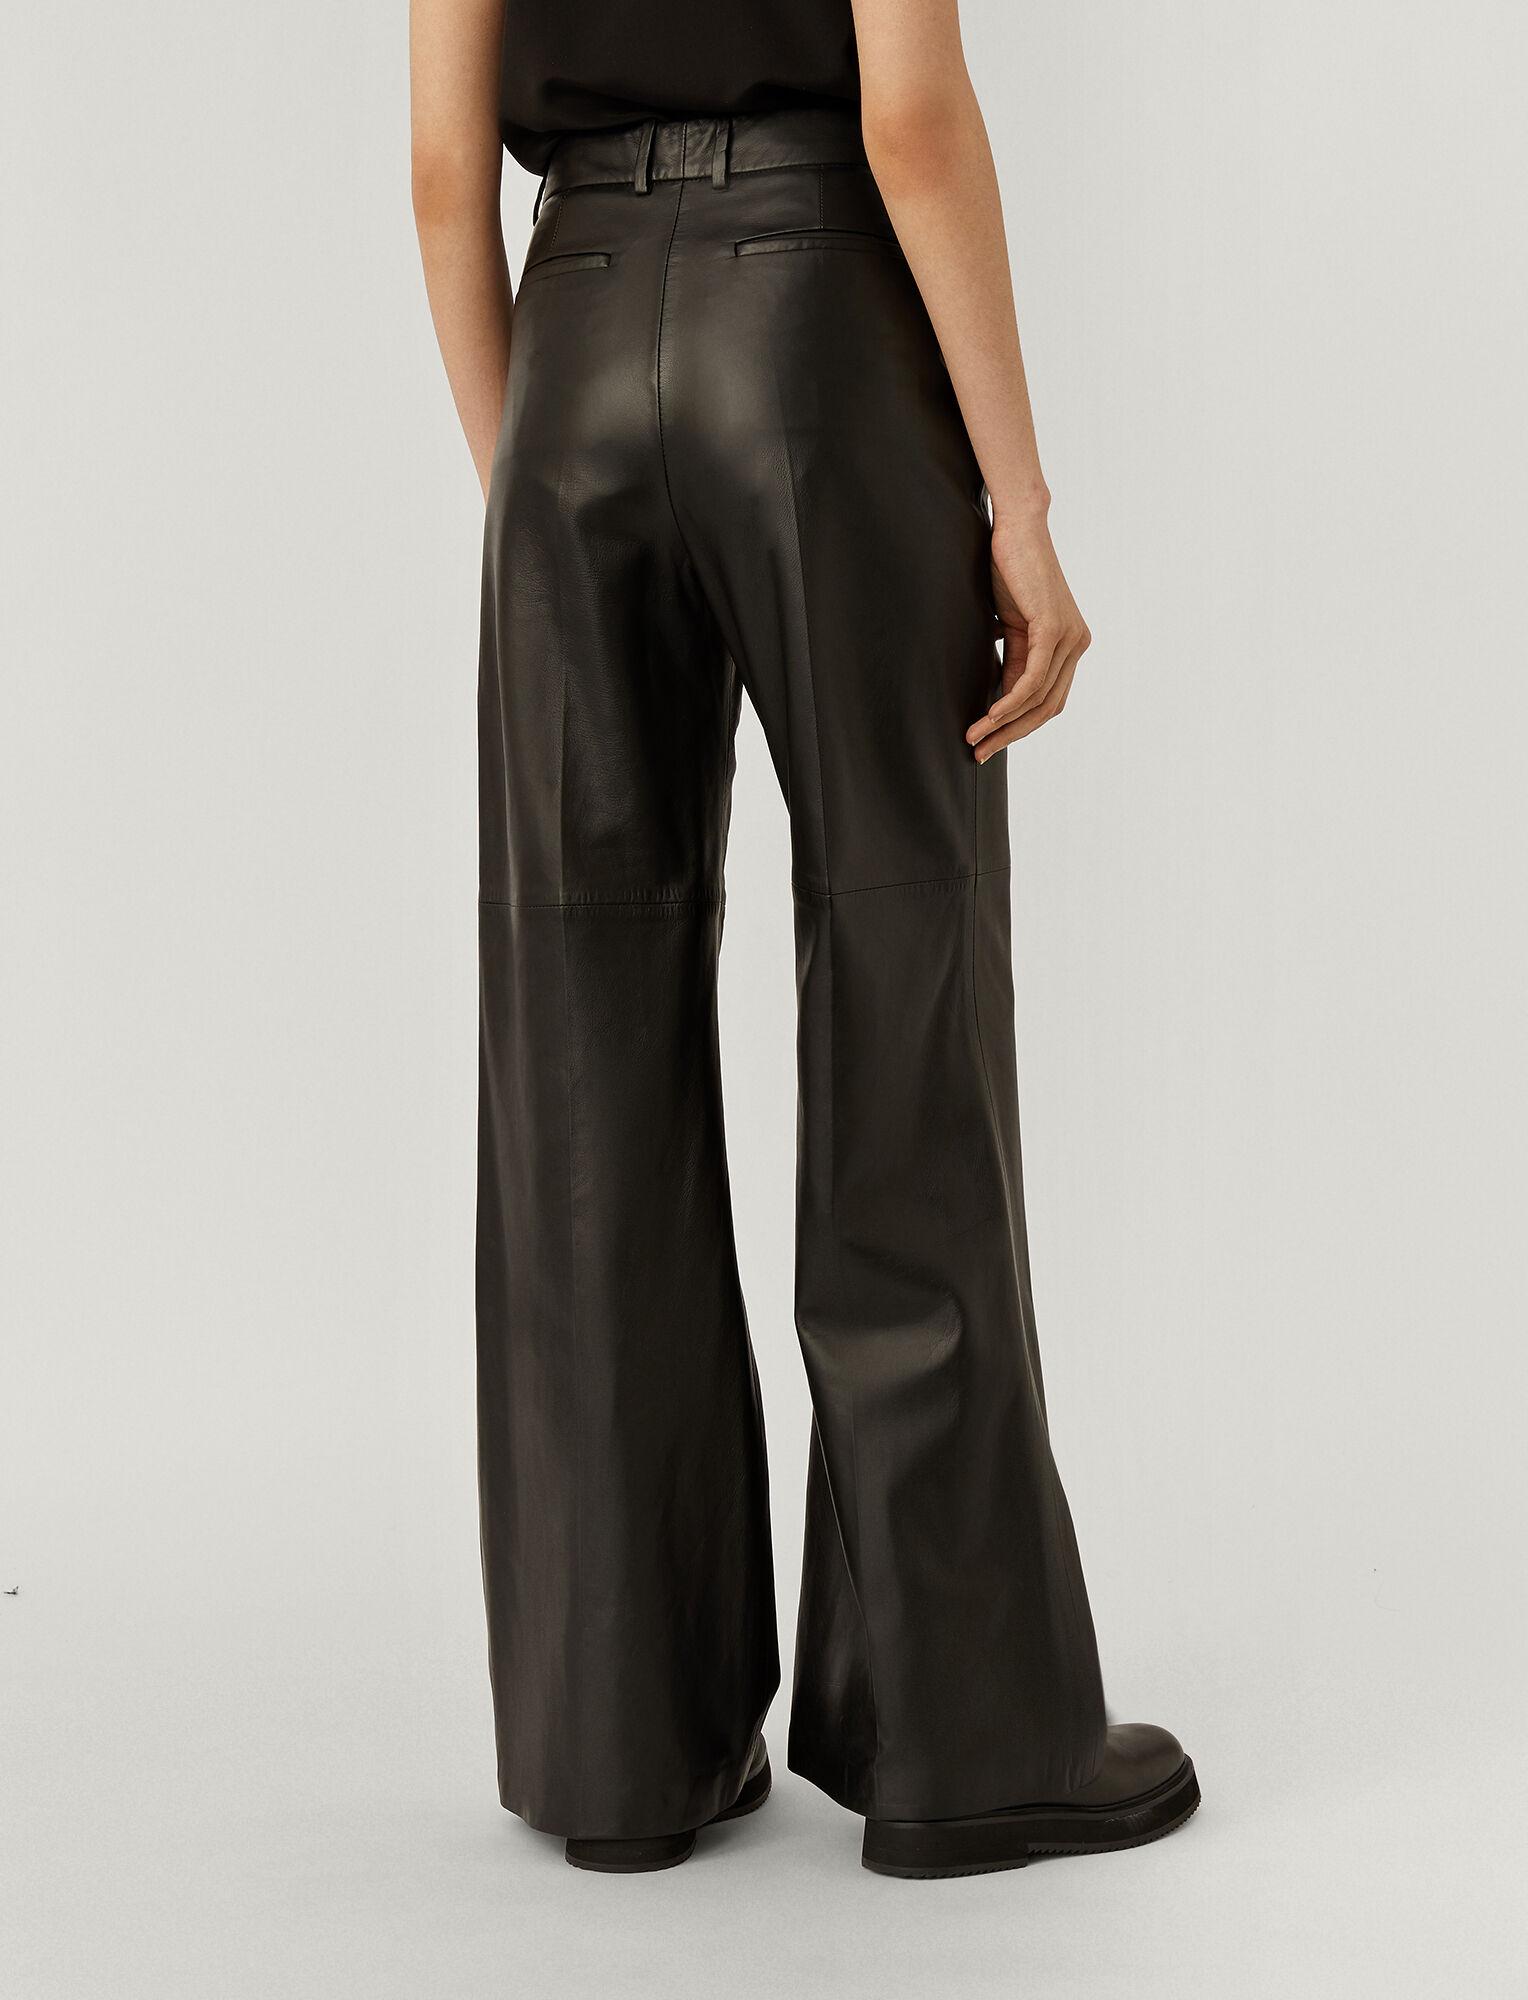 Joseph, Tambo Nappa Leather Bottom, in Black